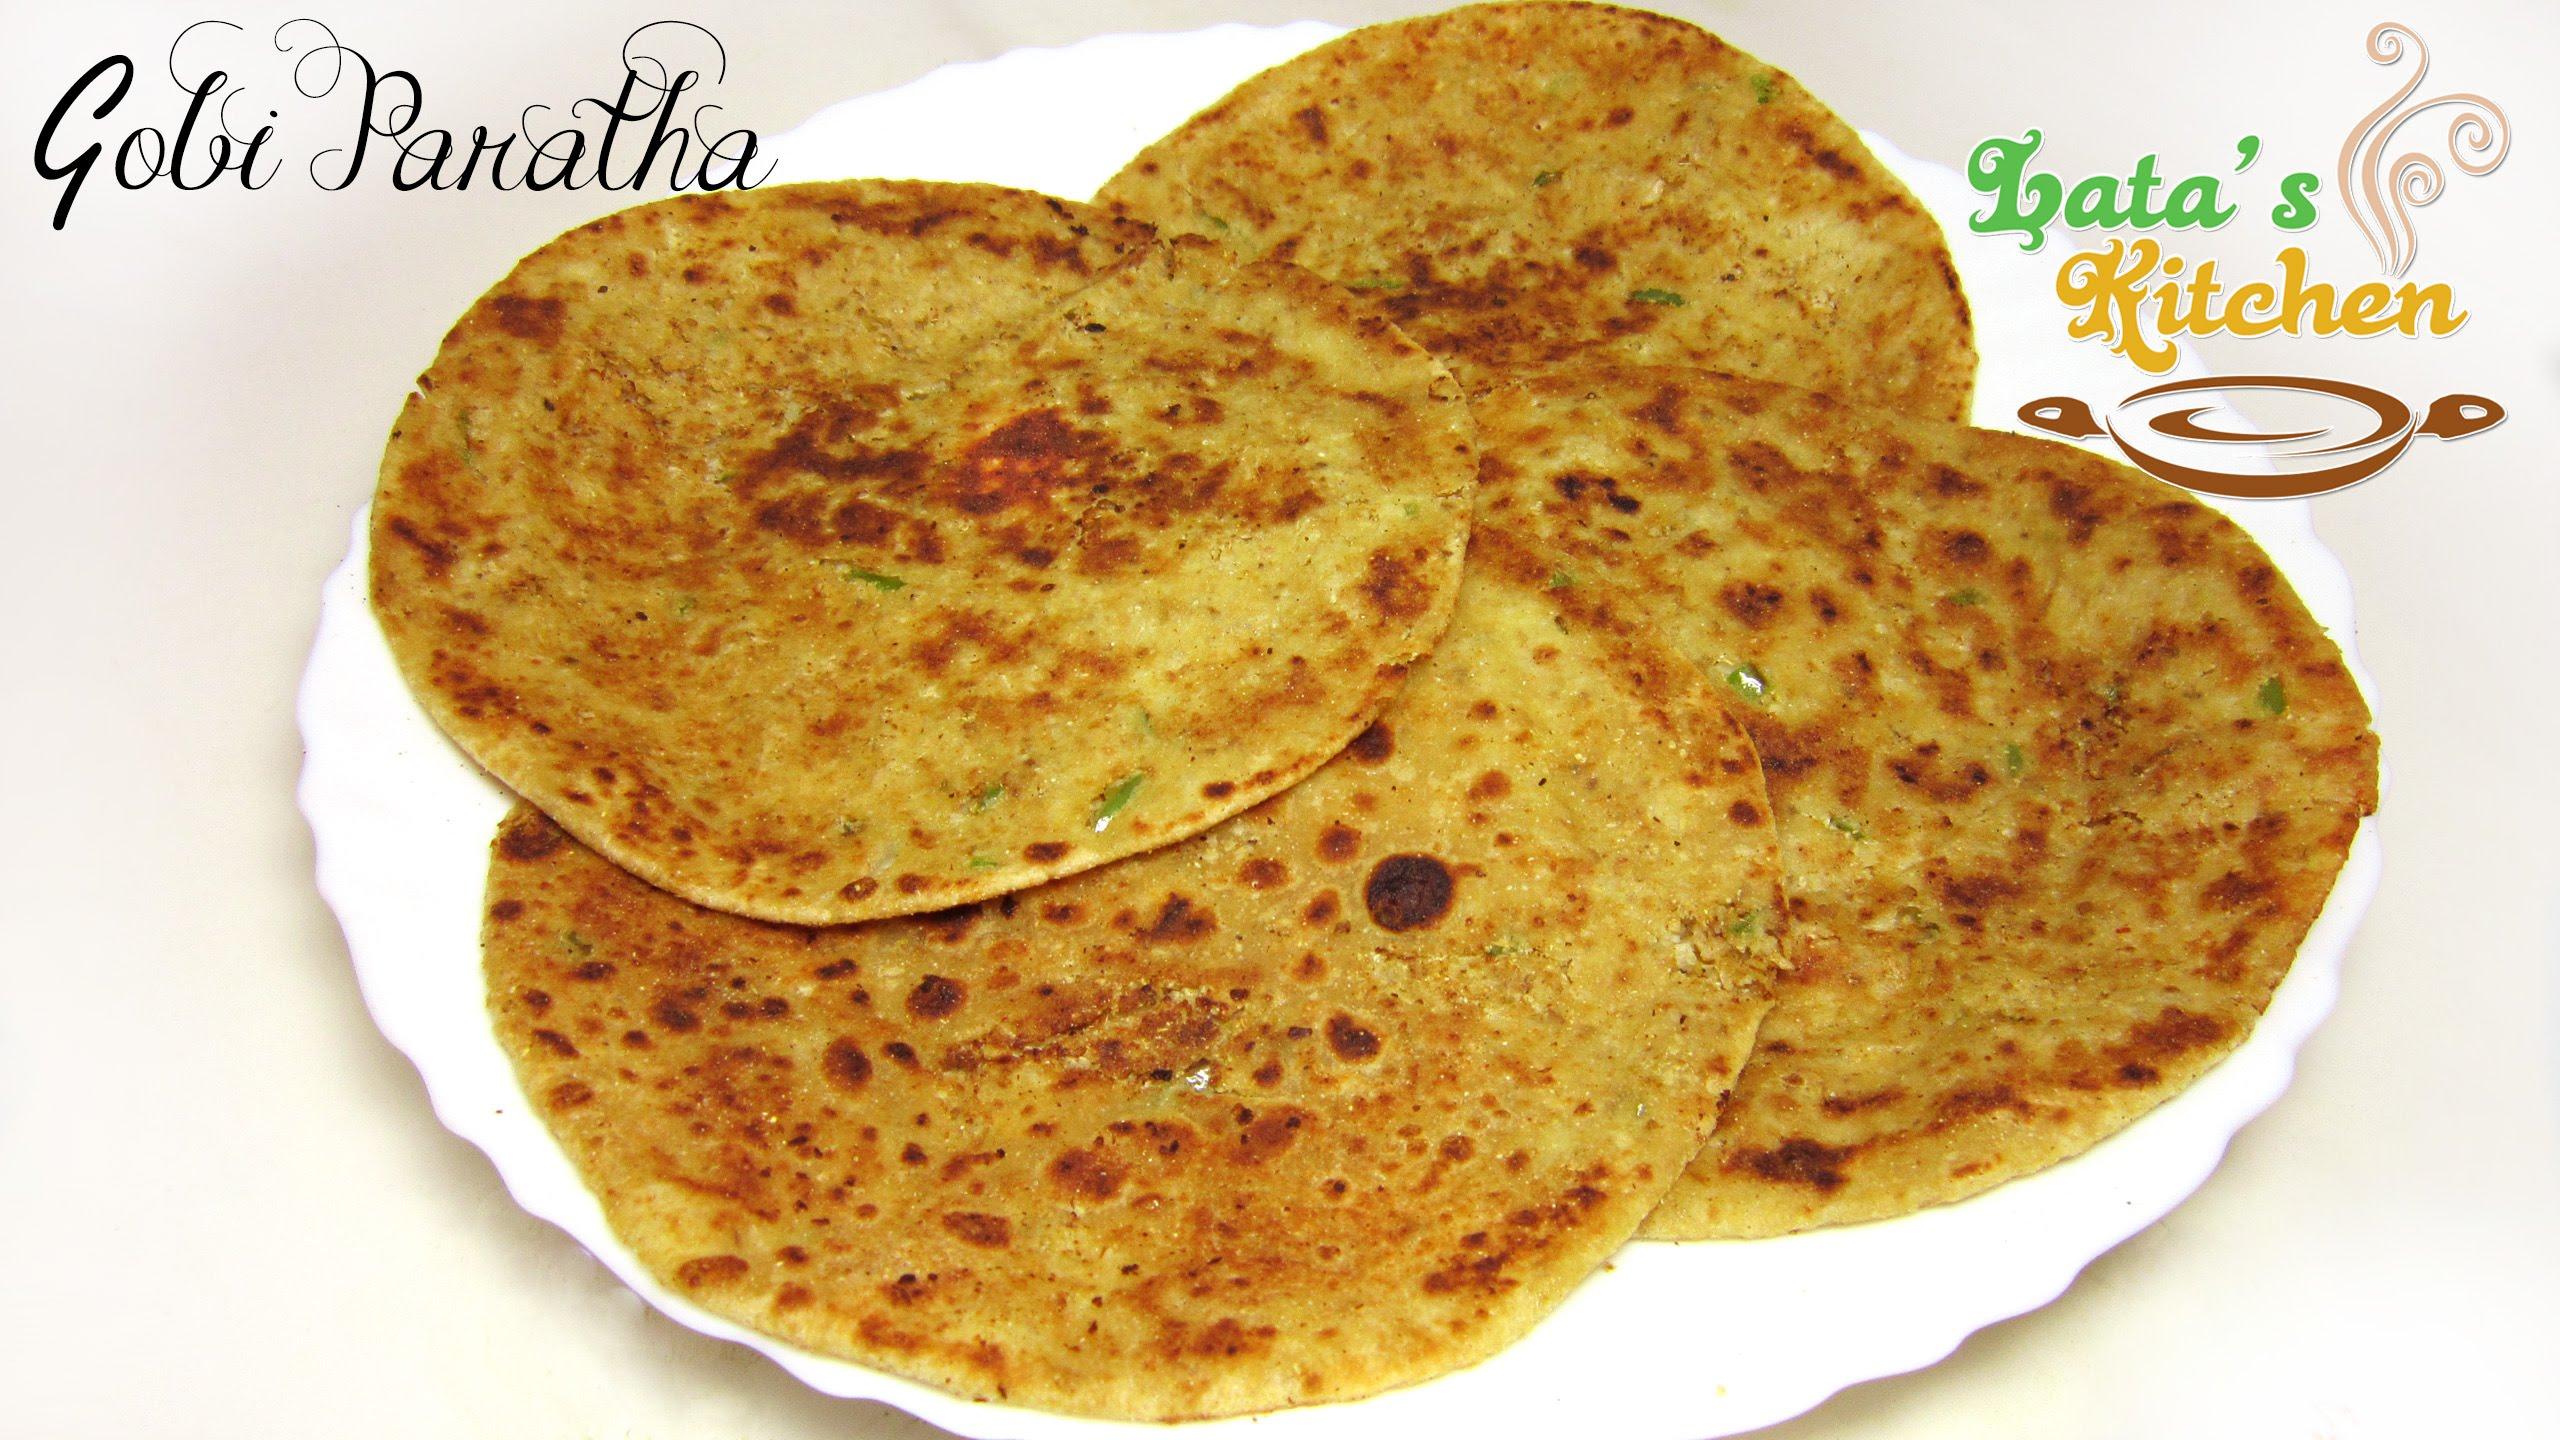 Gobi paratha recipe cauliflower stuffed indian flatbread gobi paratha recipe cauliflower stuffed indian flatbread vegetarian recipe video in hindi justrightfood forumfinder Images